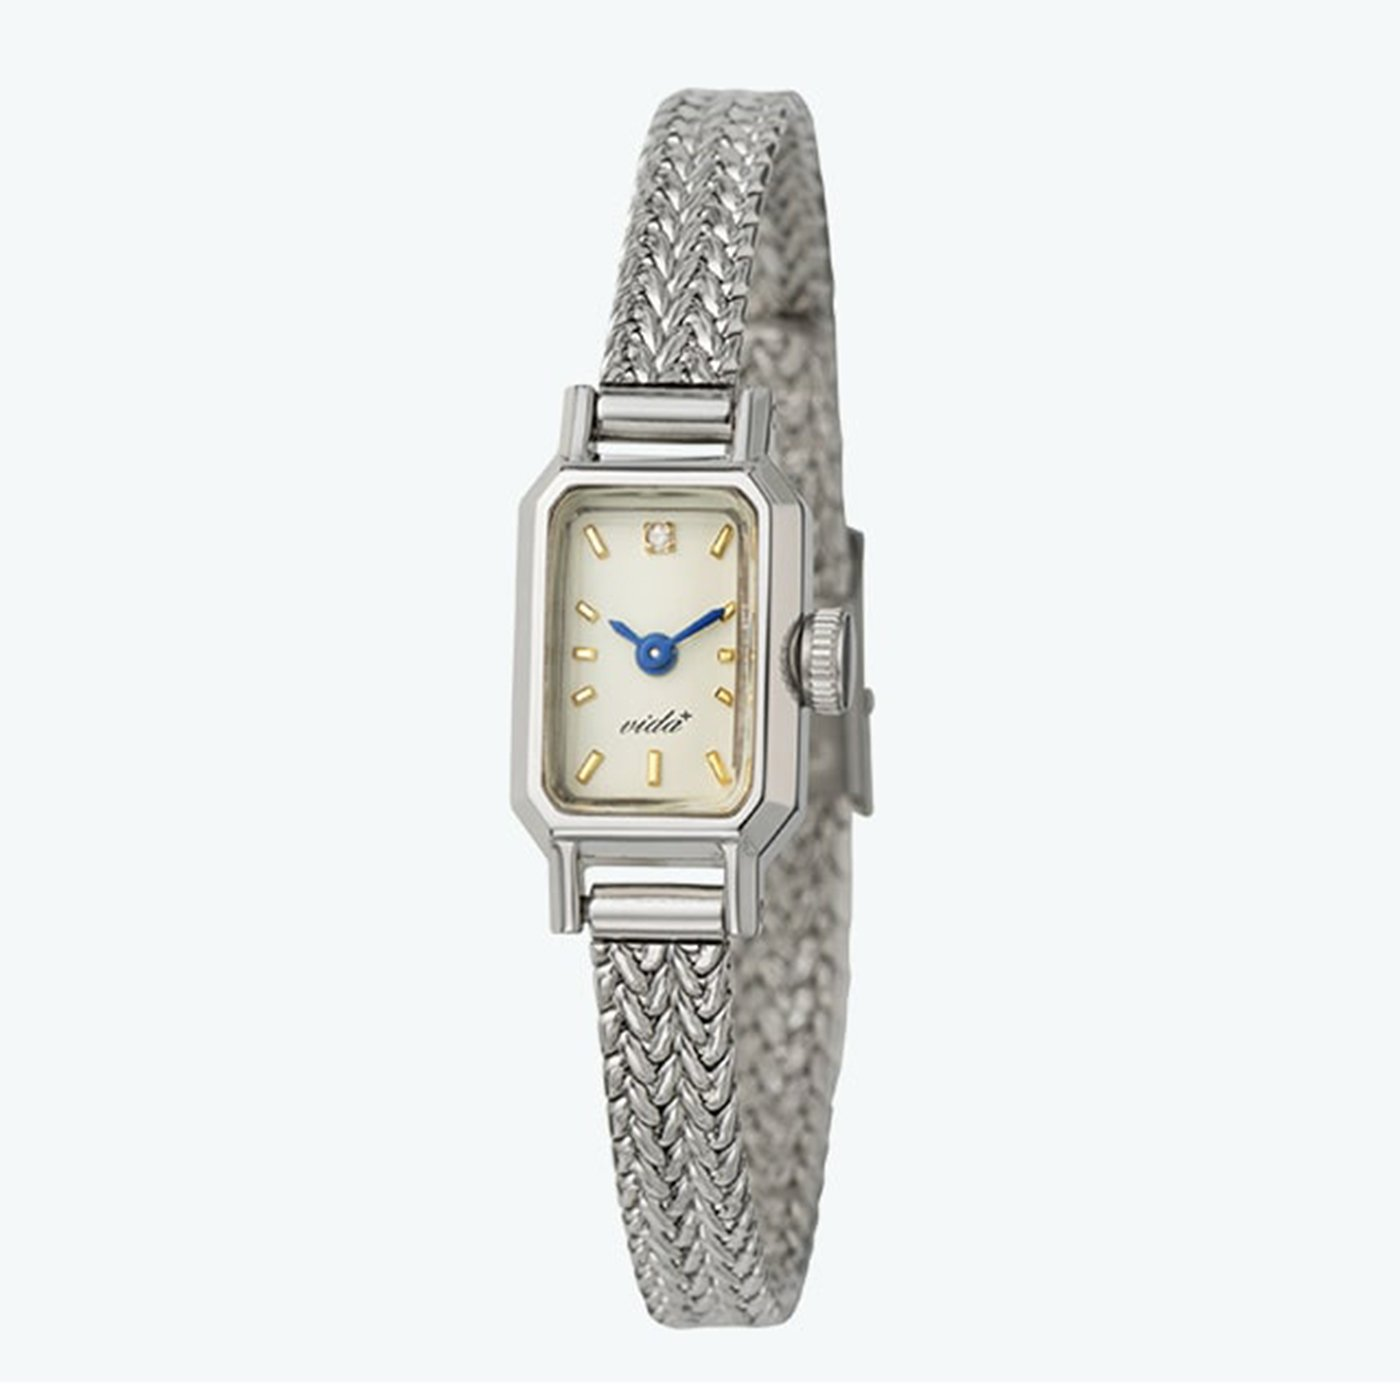 IEDIT[イディット] SELECT VIDA+ ヴィーダプラス 12時位置のダイヤモンドが輝くアヤメ織りベルト時計〈シルバー〉 J84967SM